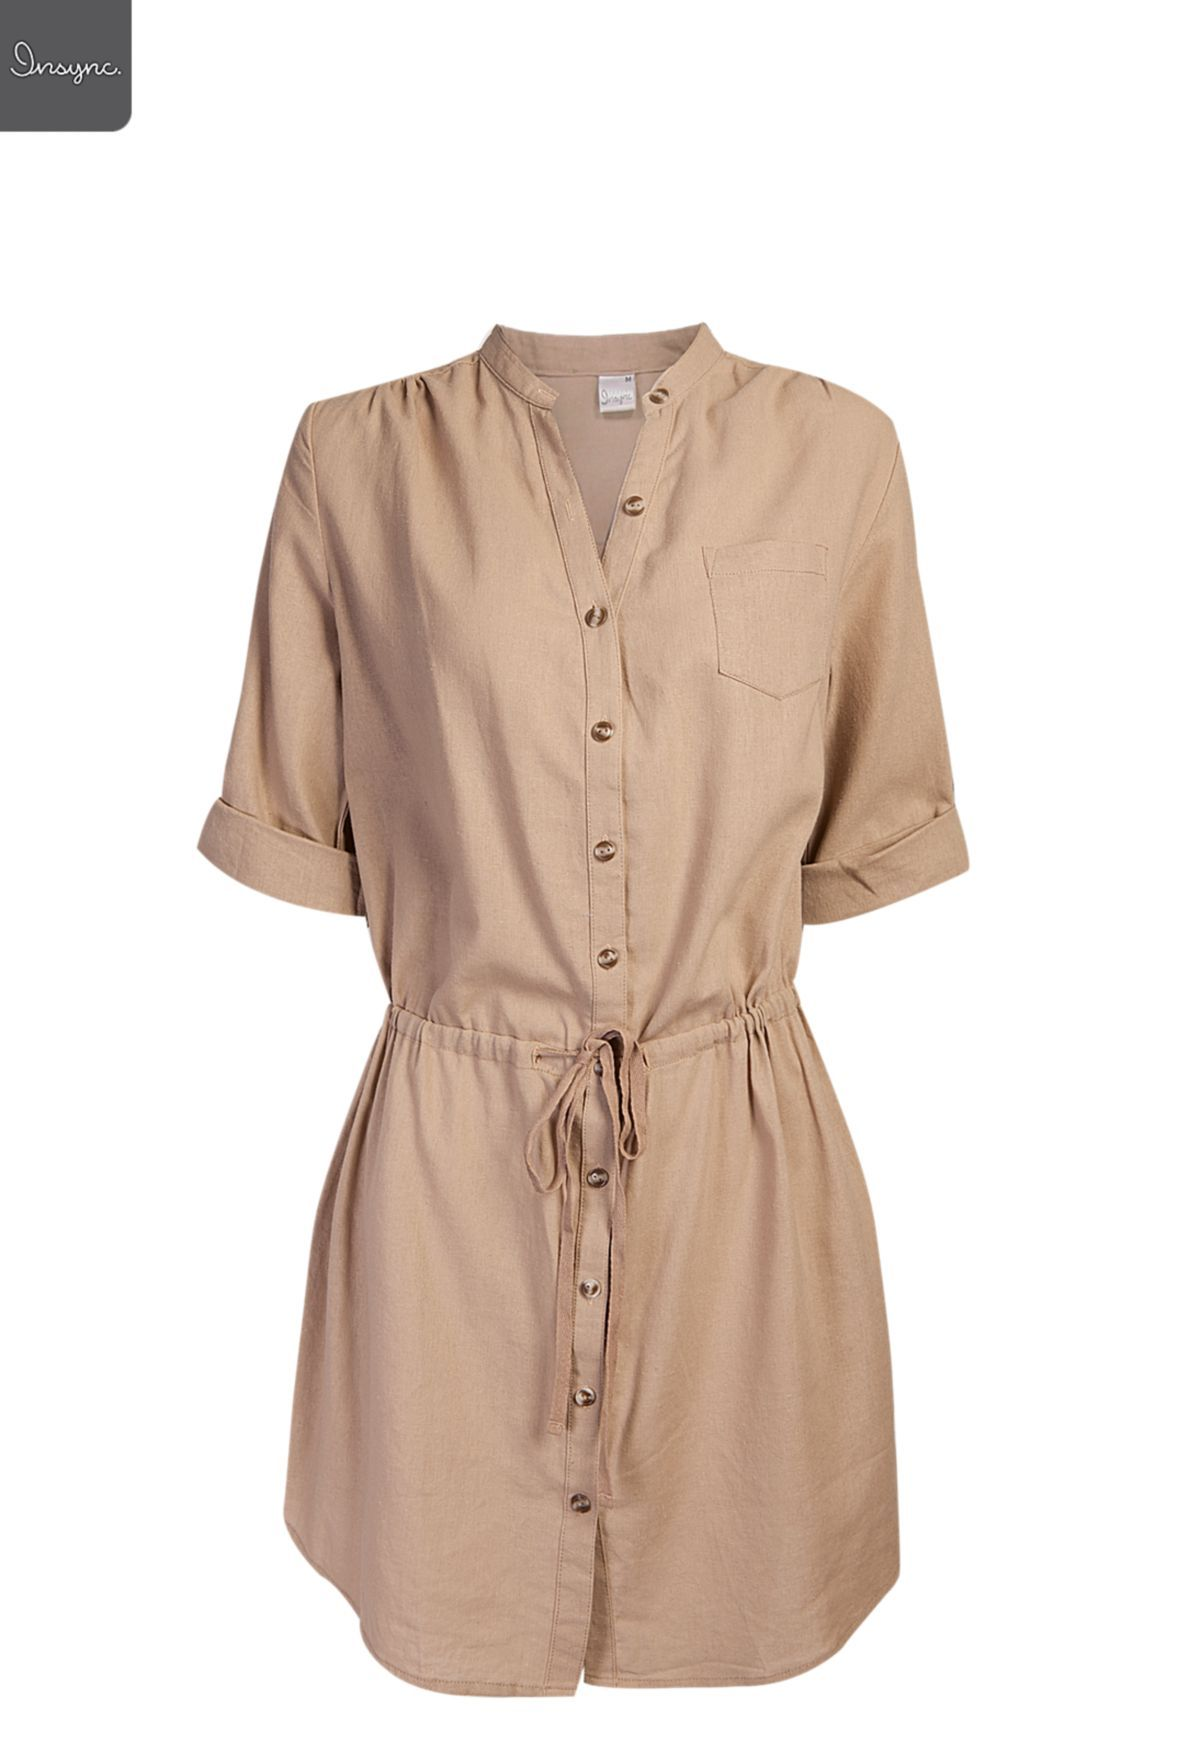 Mr Price (R100) | Dresses, Skirts, Jumpsuits | Pinterest | Ladies ...